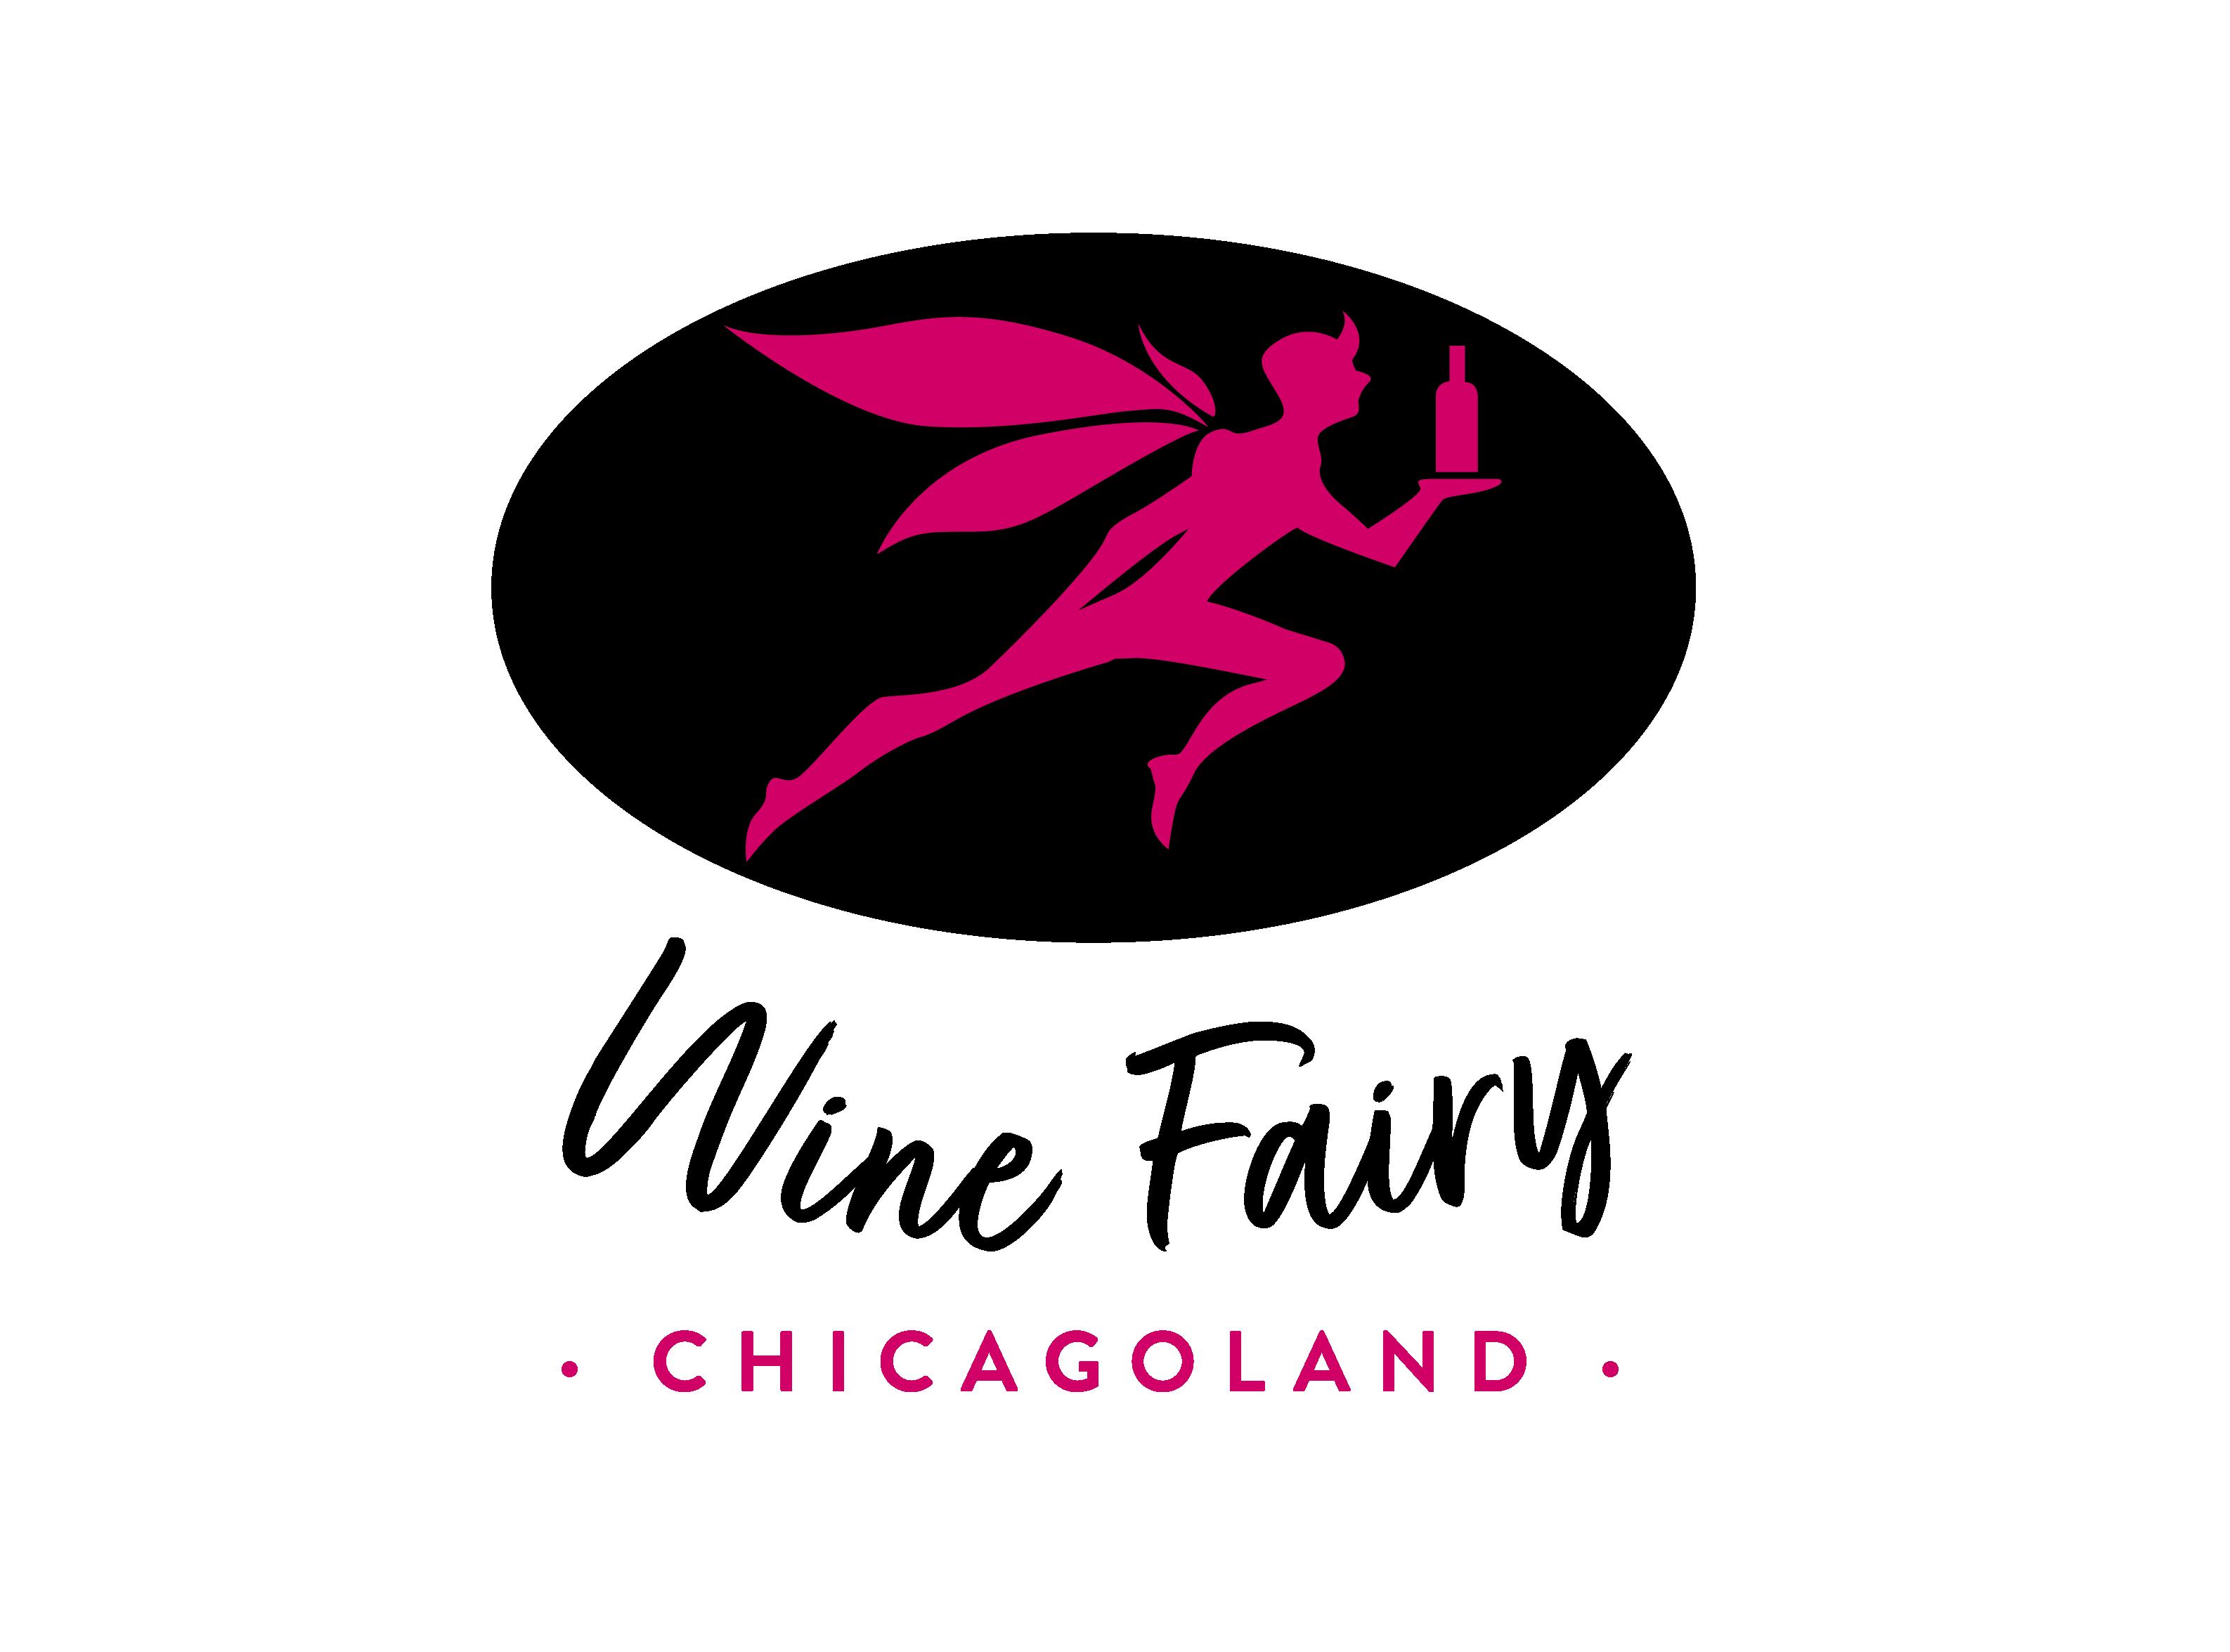 Wine Fairy Chicagoland